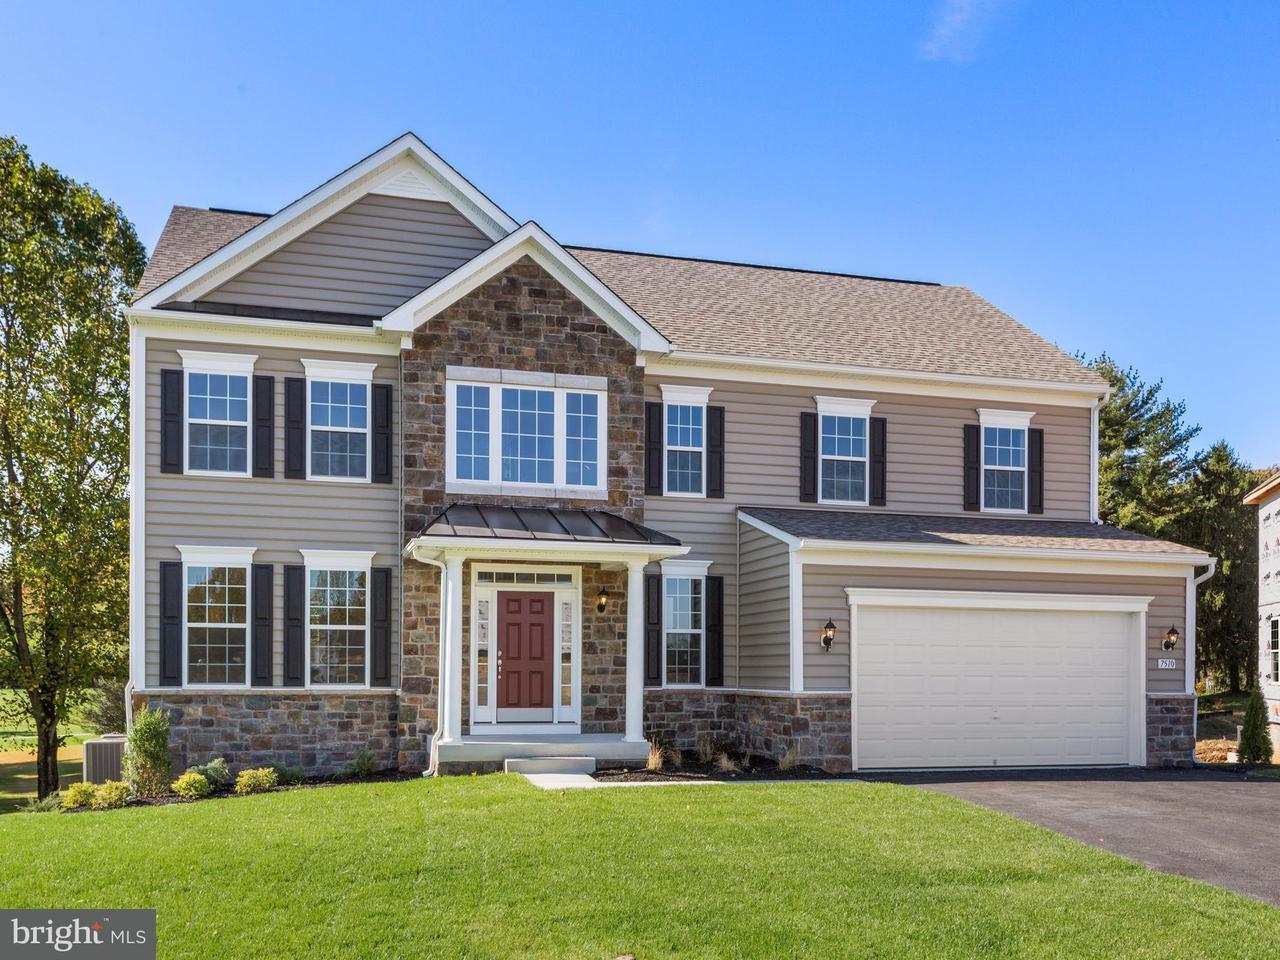 Casa Unifamiliar por un Venta en 7510 FISHER Court 7510 FISHER Court Jessup, Maryland 20794 Estados Unidos